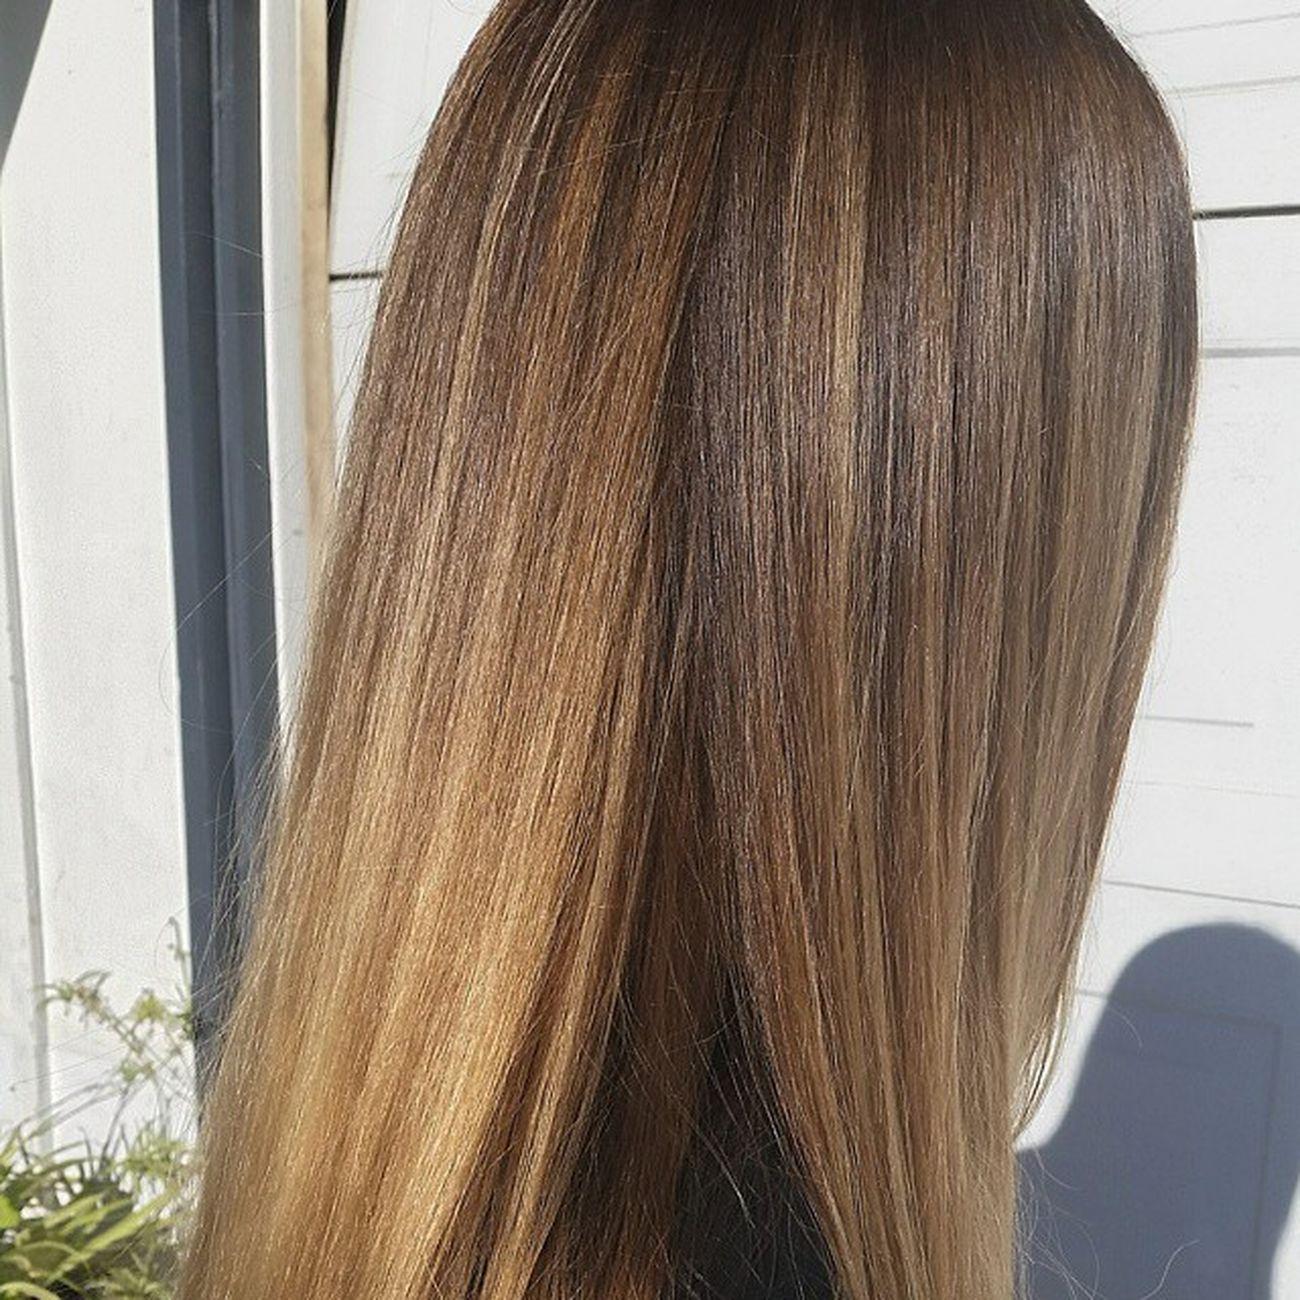 @AloxxiInternational loven your Tones GoldenBlonde ShyaneLaas Blondehairdontcare @SalonRepublicBH